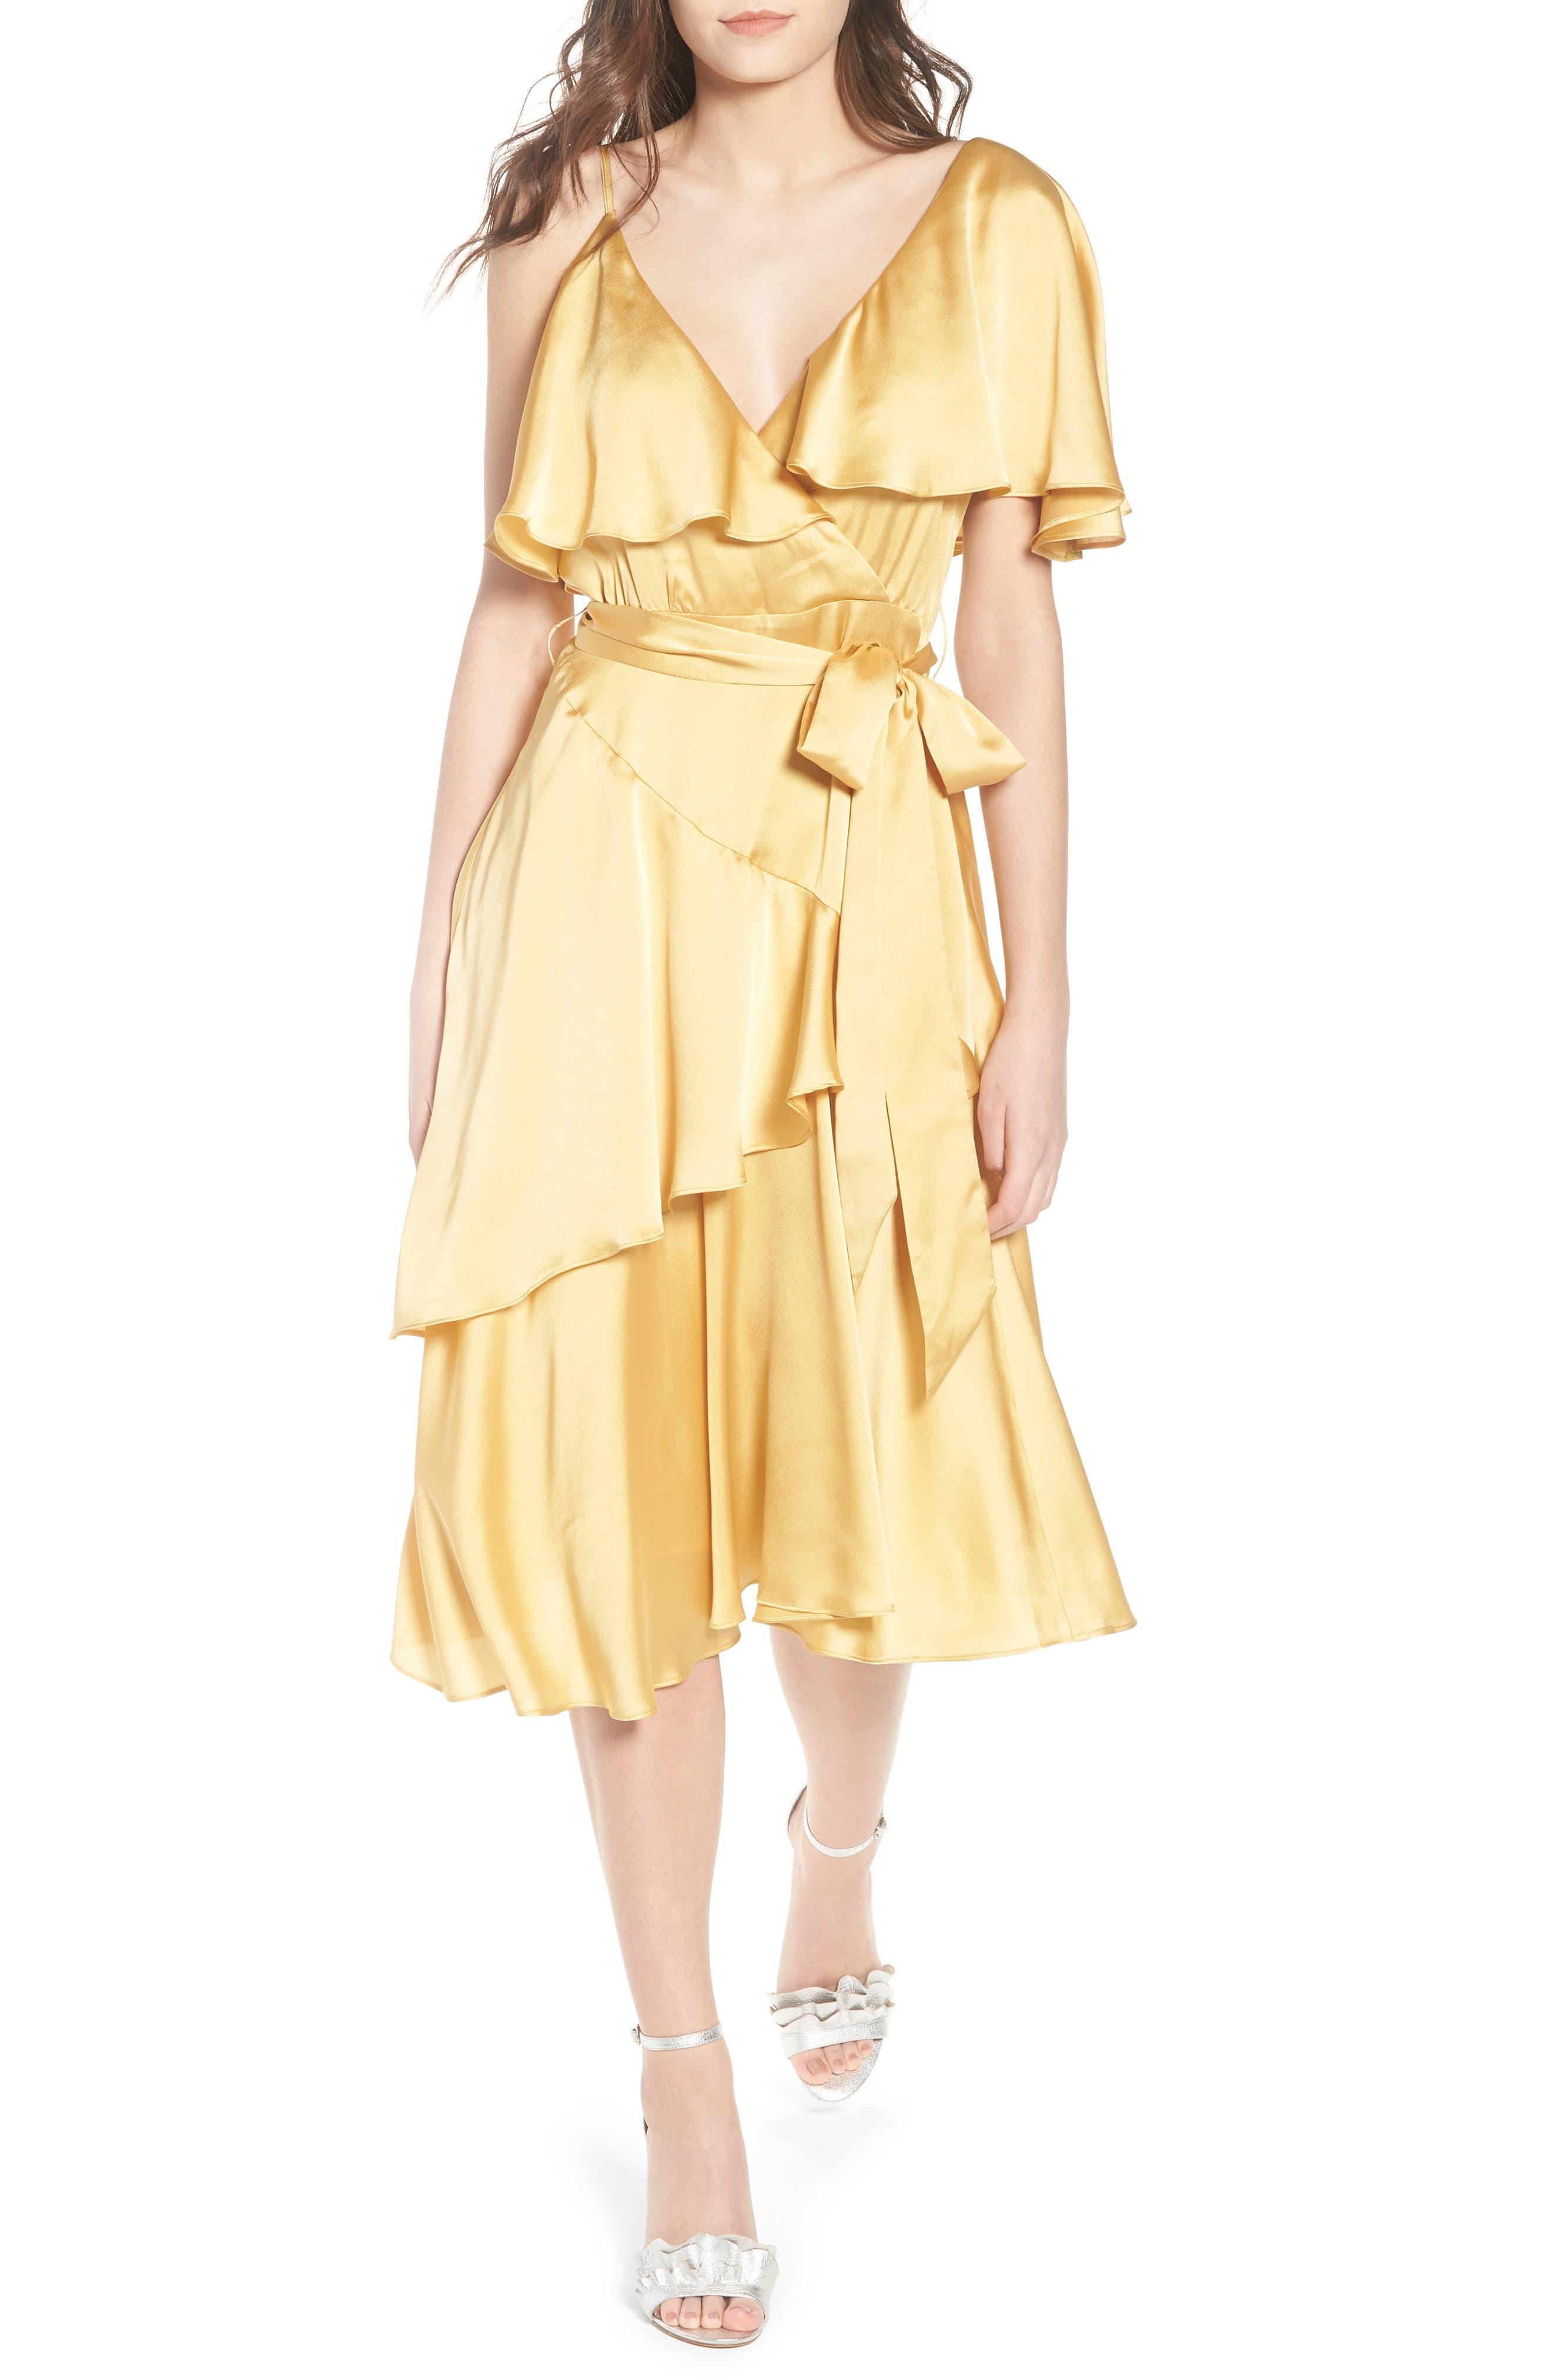 Deconstructed Tea Dress,                             Main thumbnail 1, color,